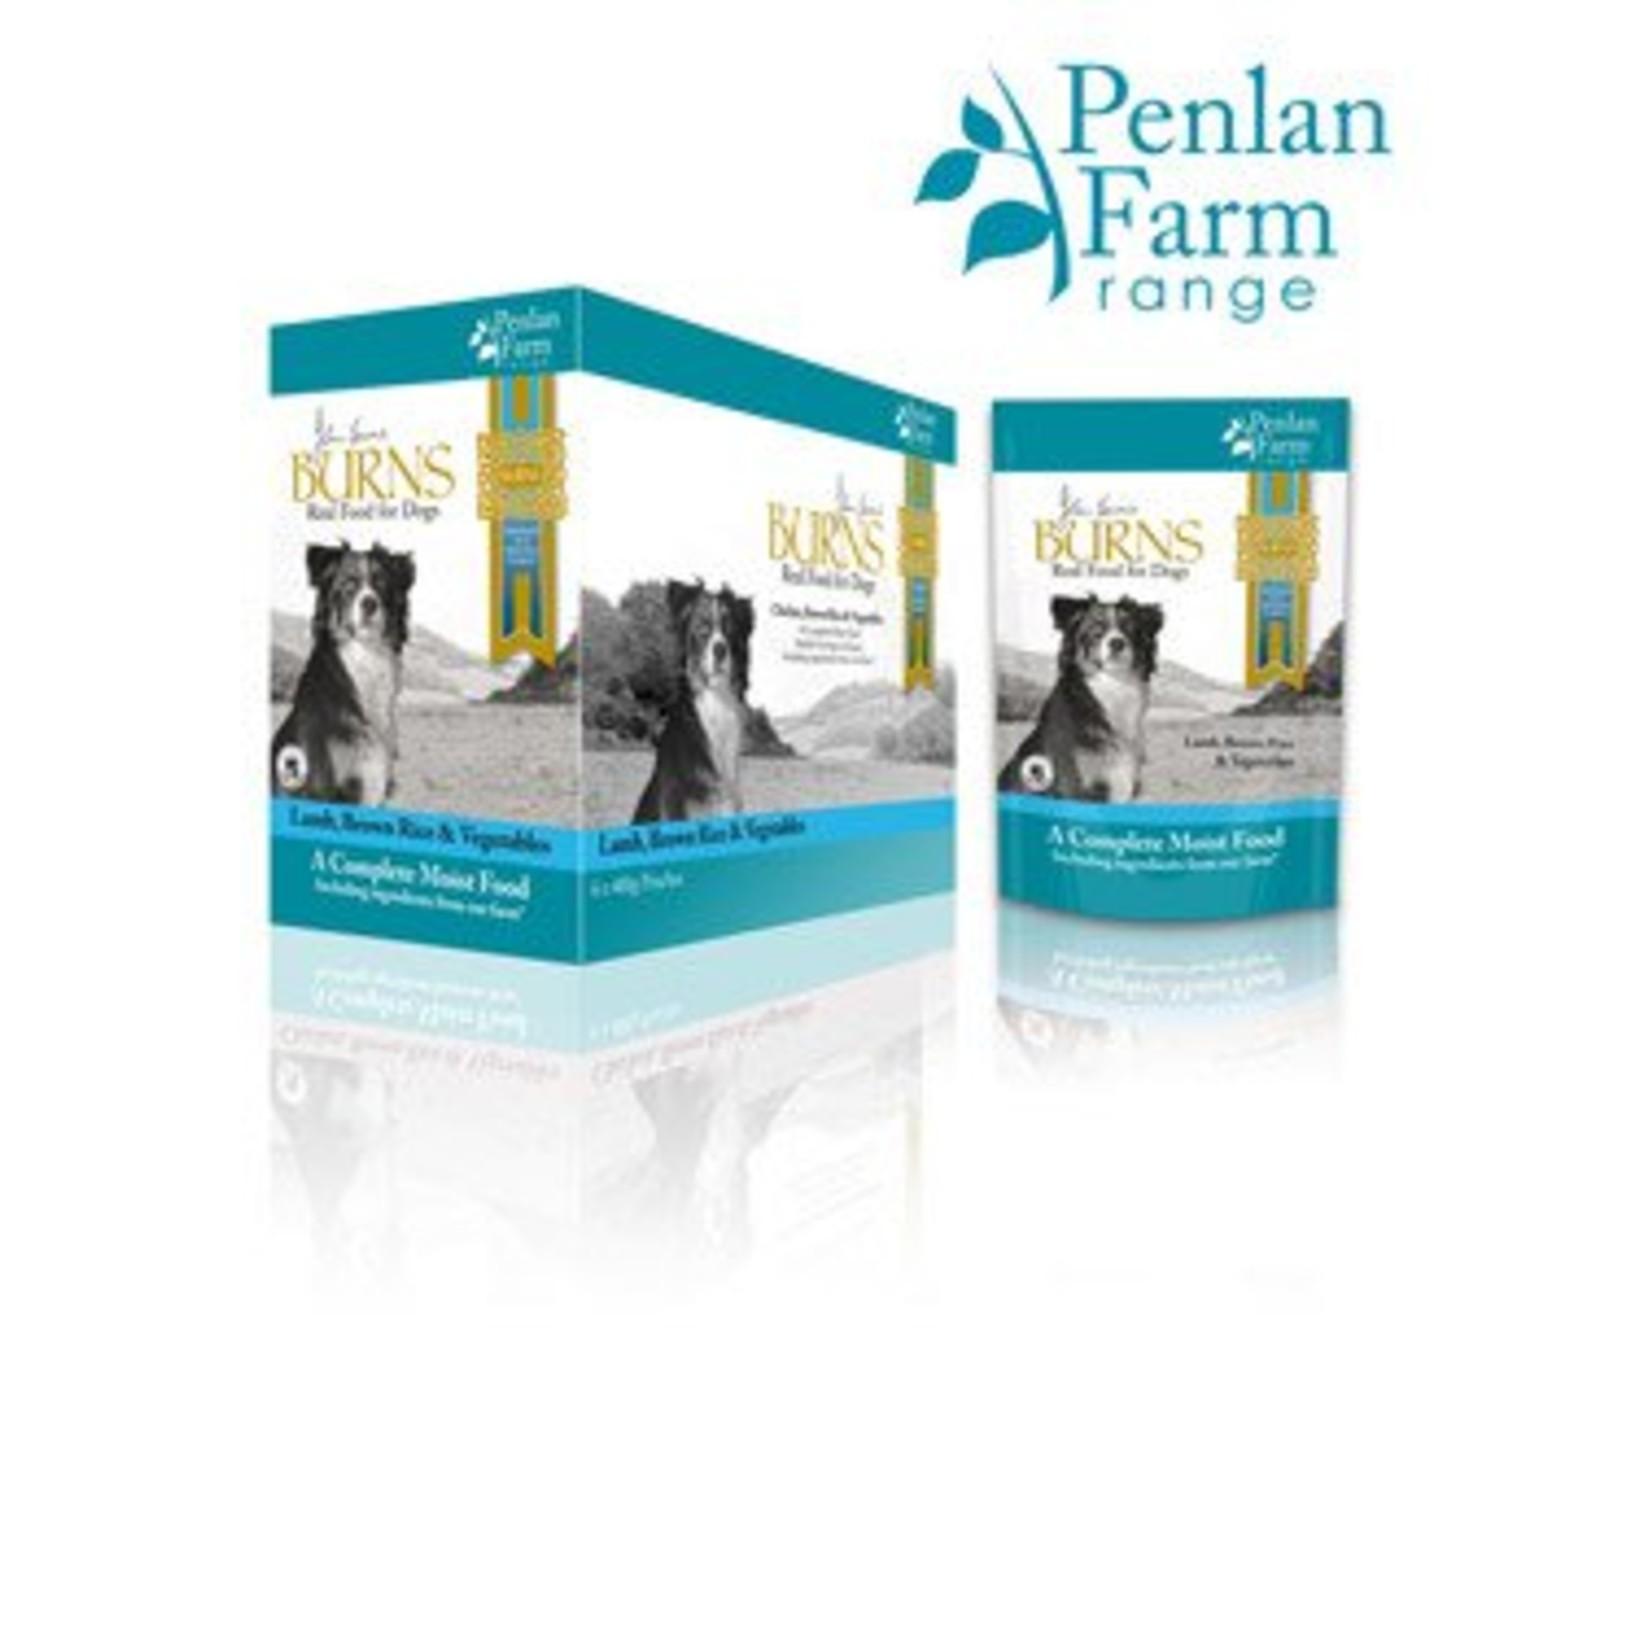 Burns Penlan Farm Dog Wet Food Pouch Complete Lamb Brown Rice & Veg 400g